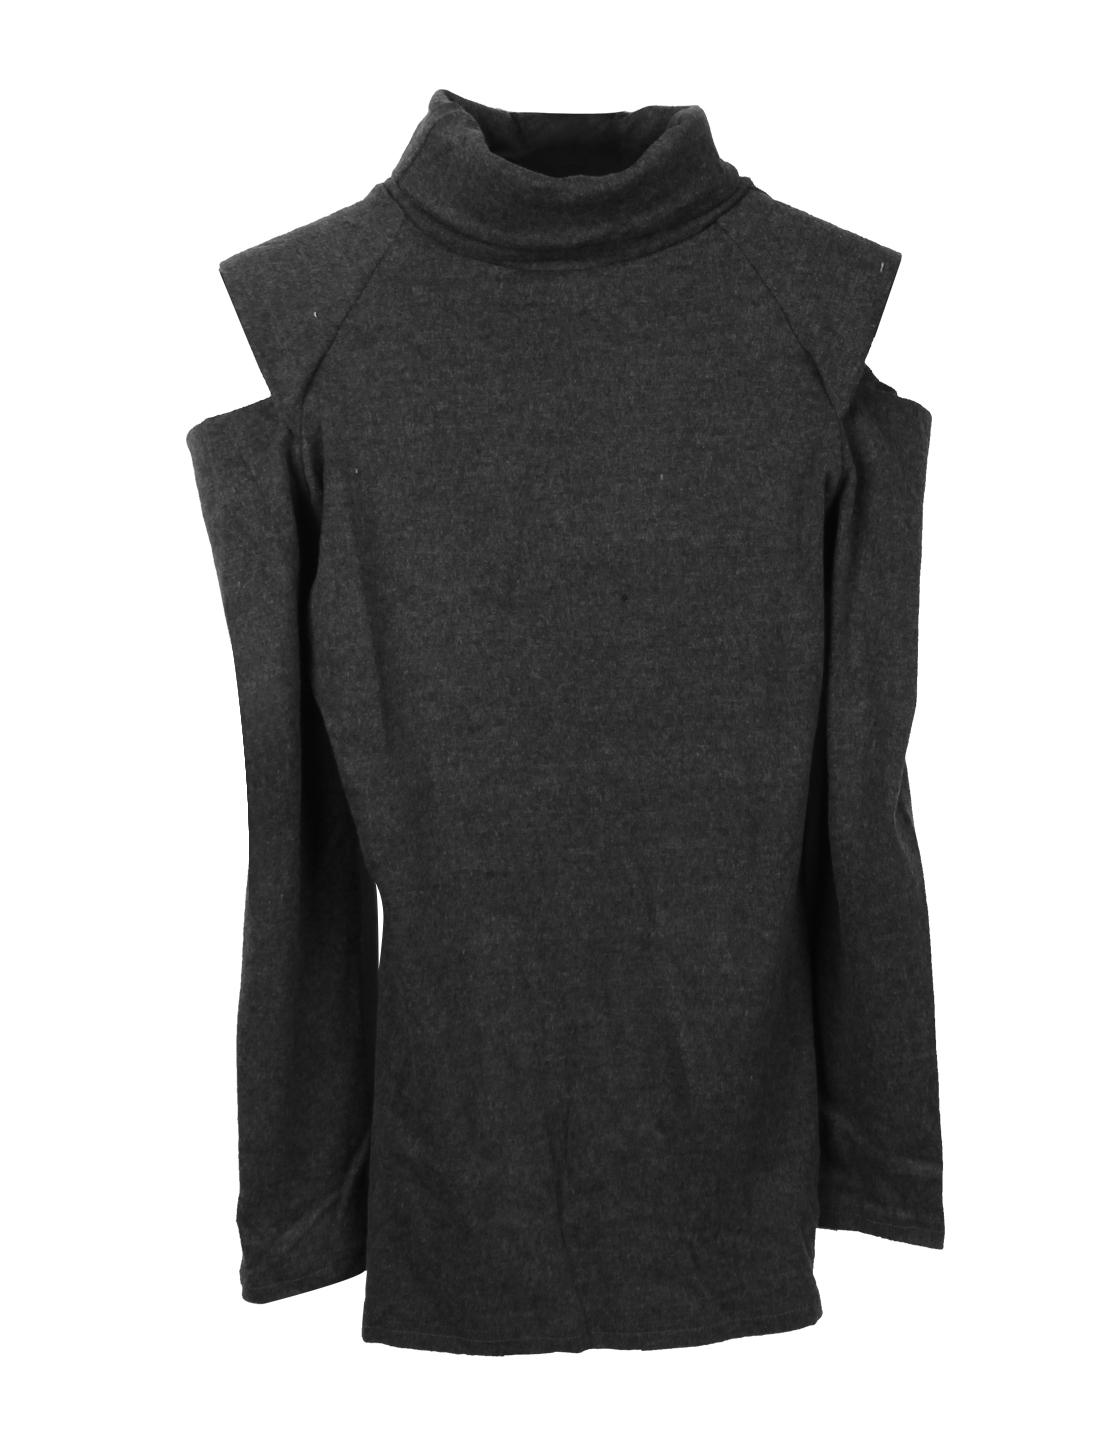 Ladies Dark Gray Turtle Neck Long Sleeves Shirt Blouse XS